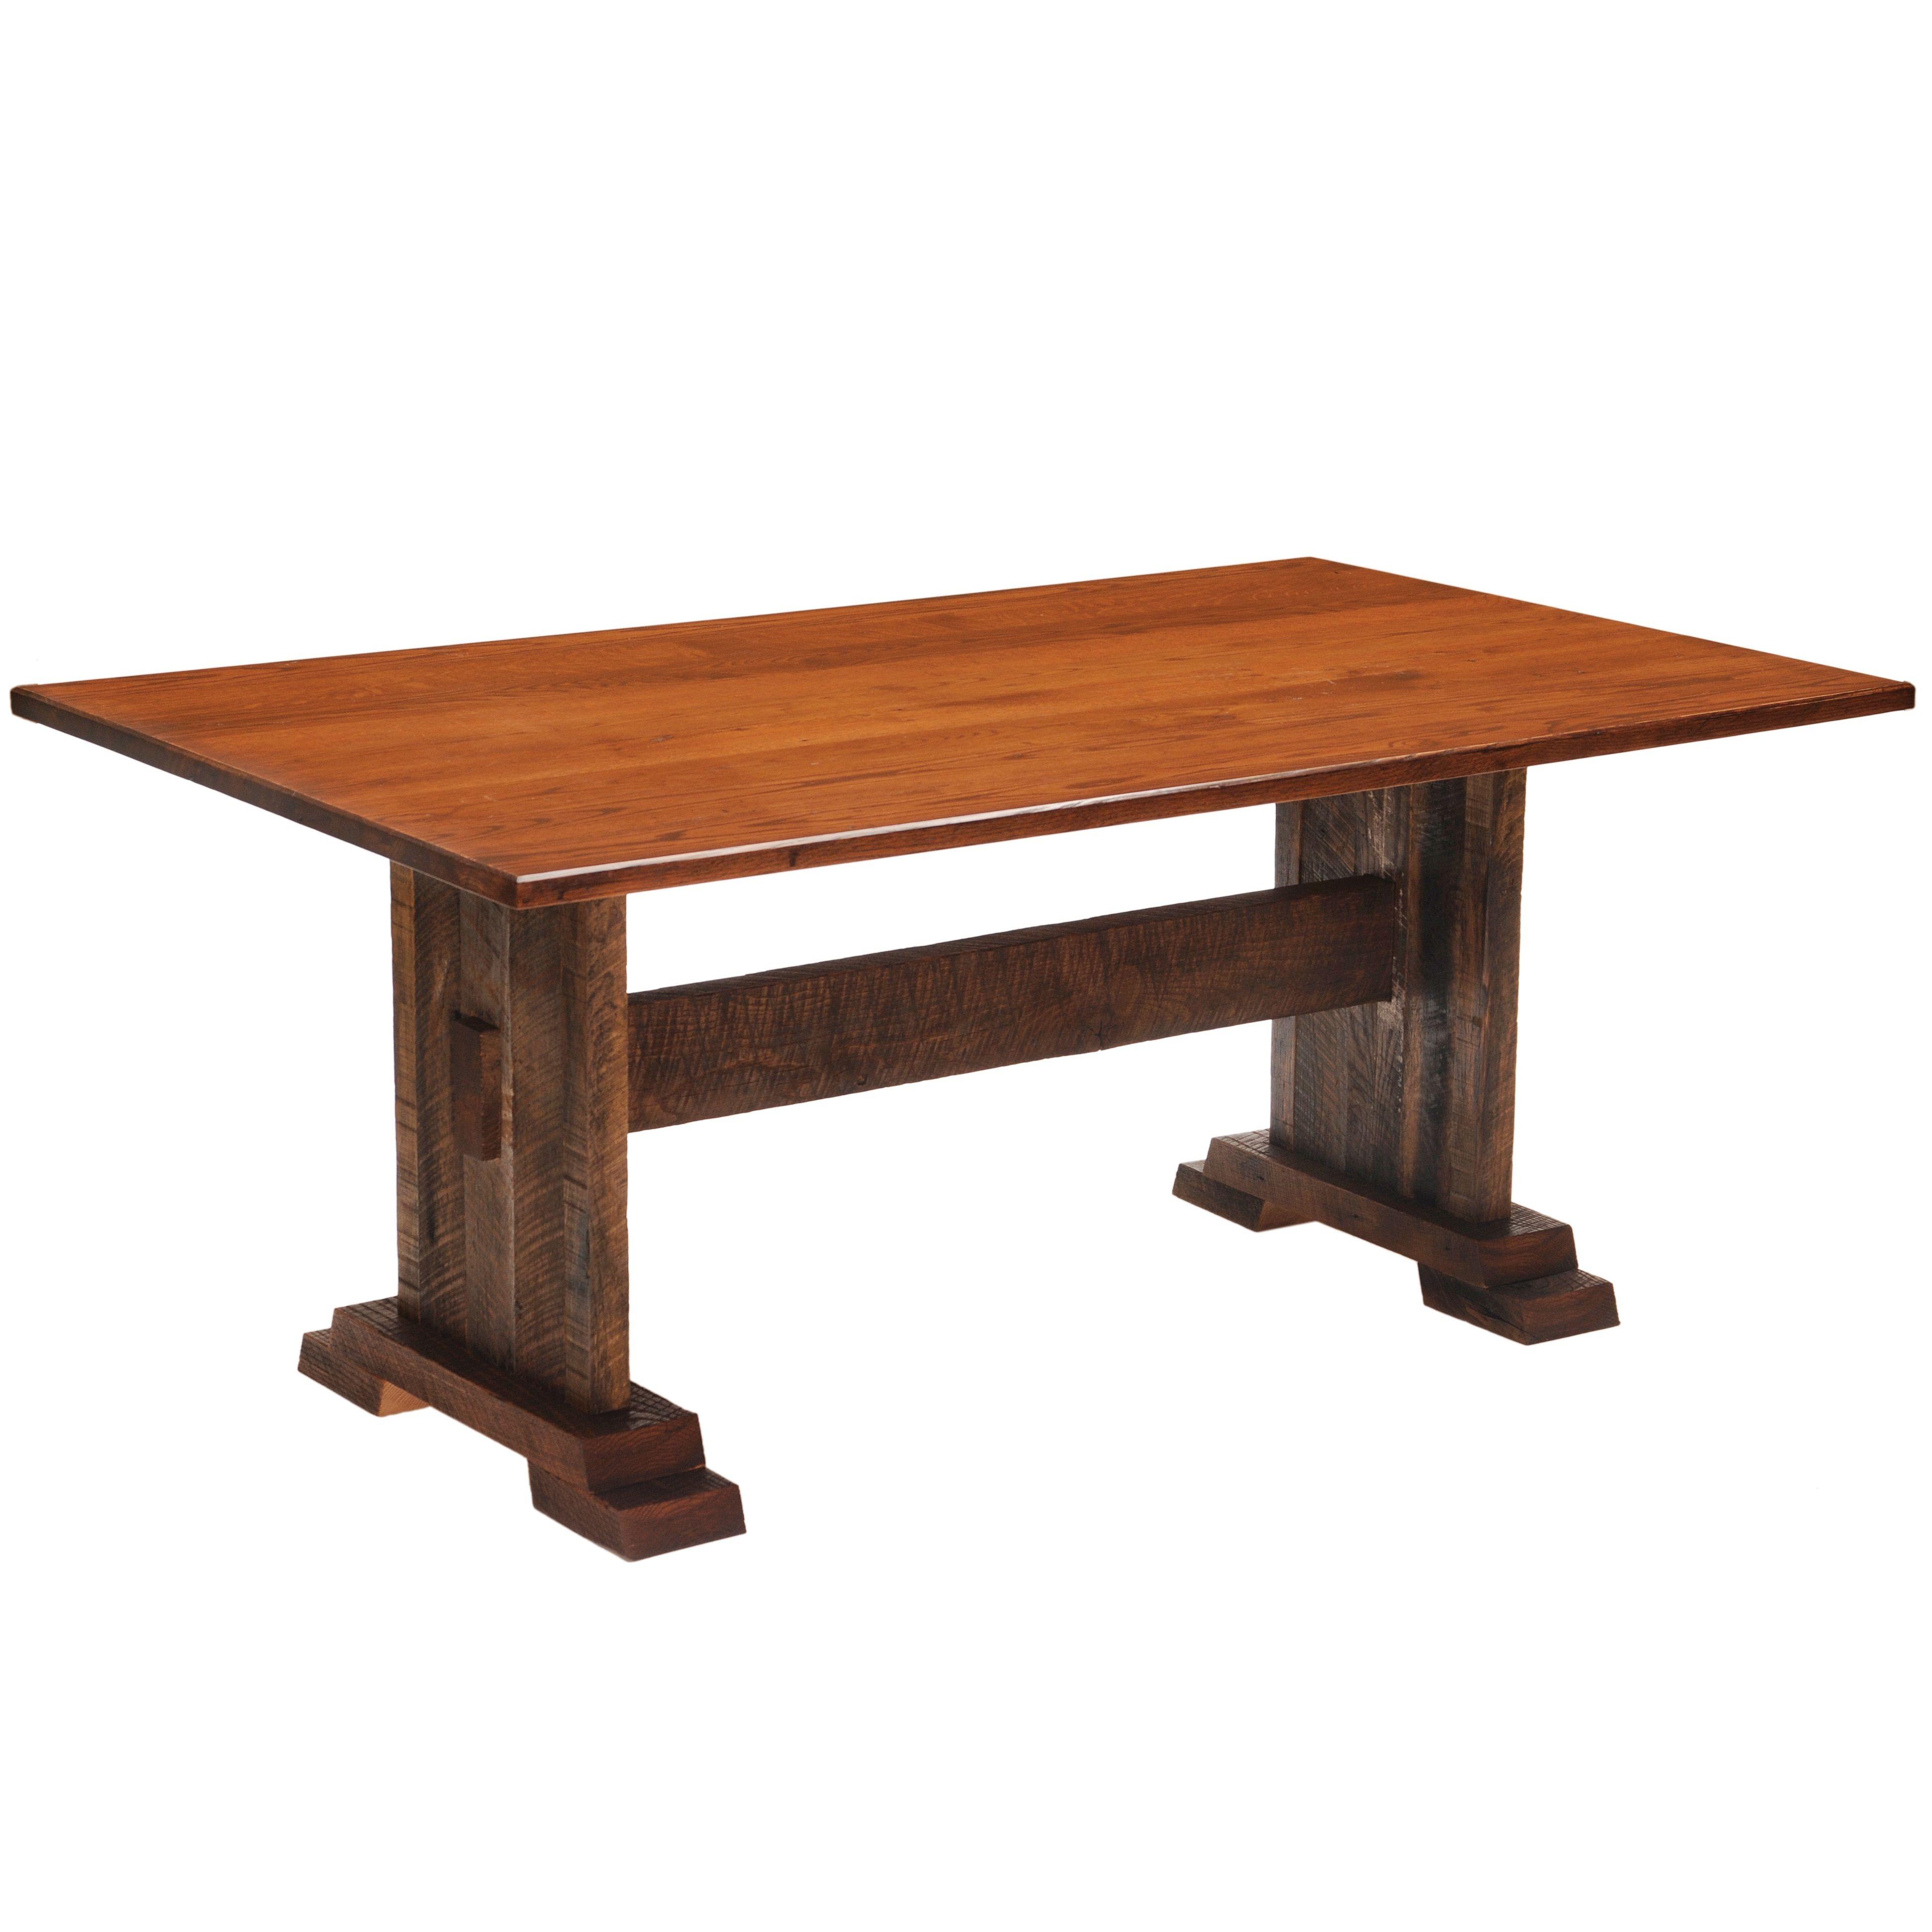 "Barnwood Harvest 84"" Antique Oak Top Rectangular Dining"